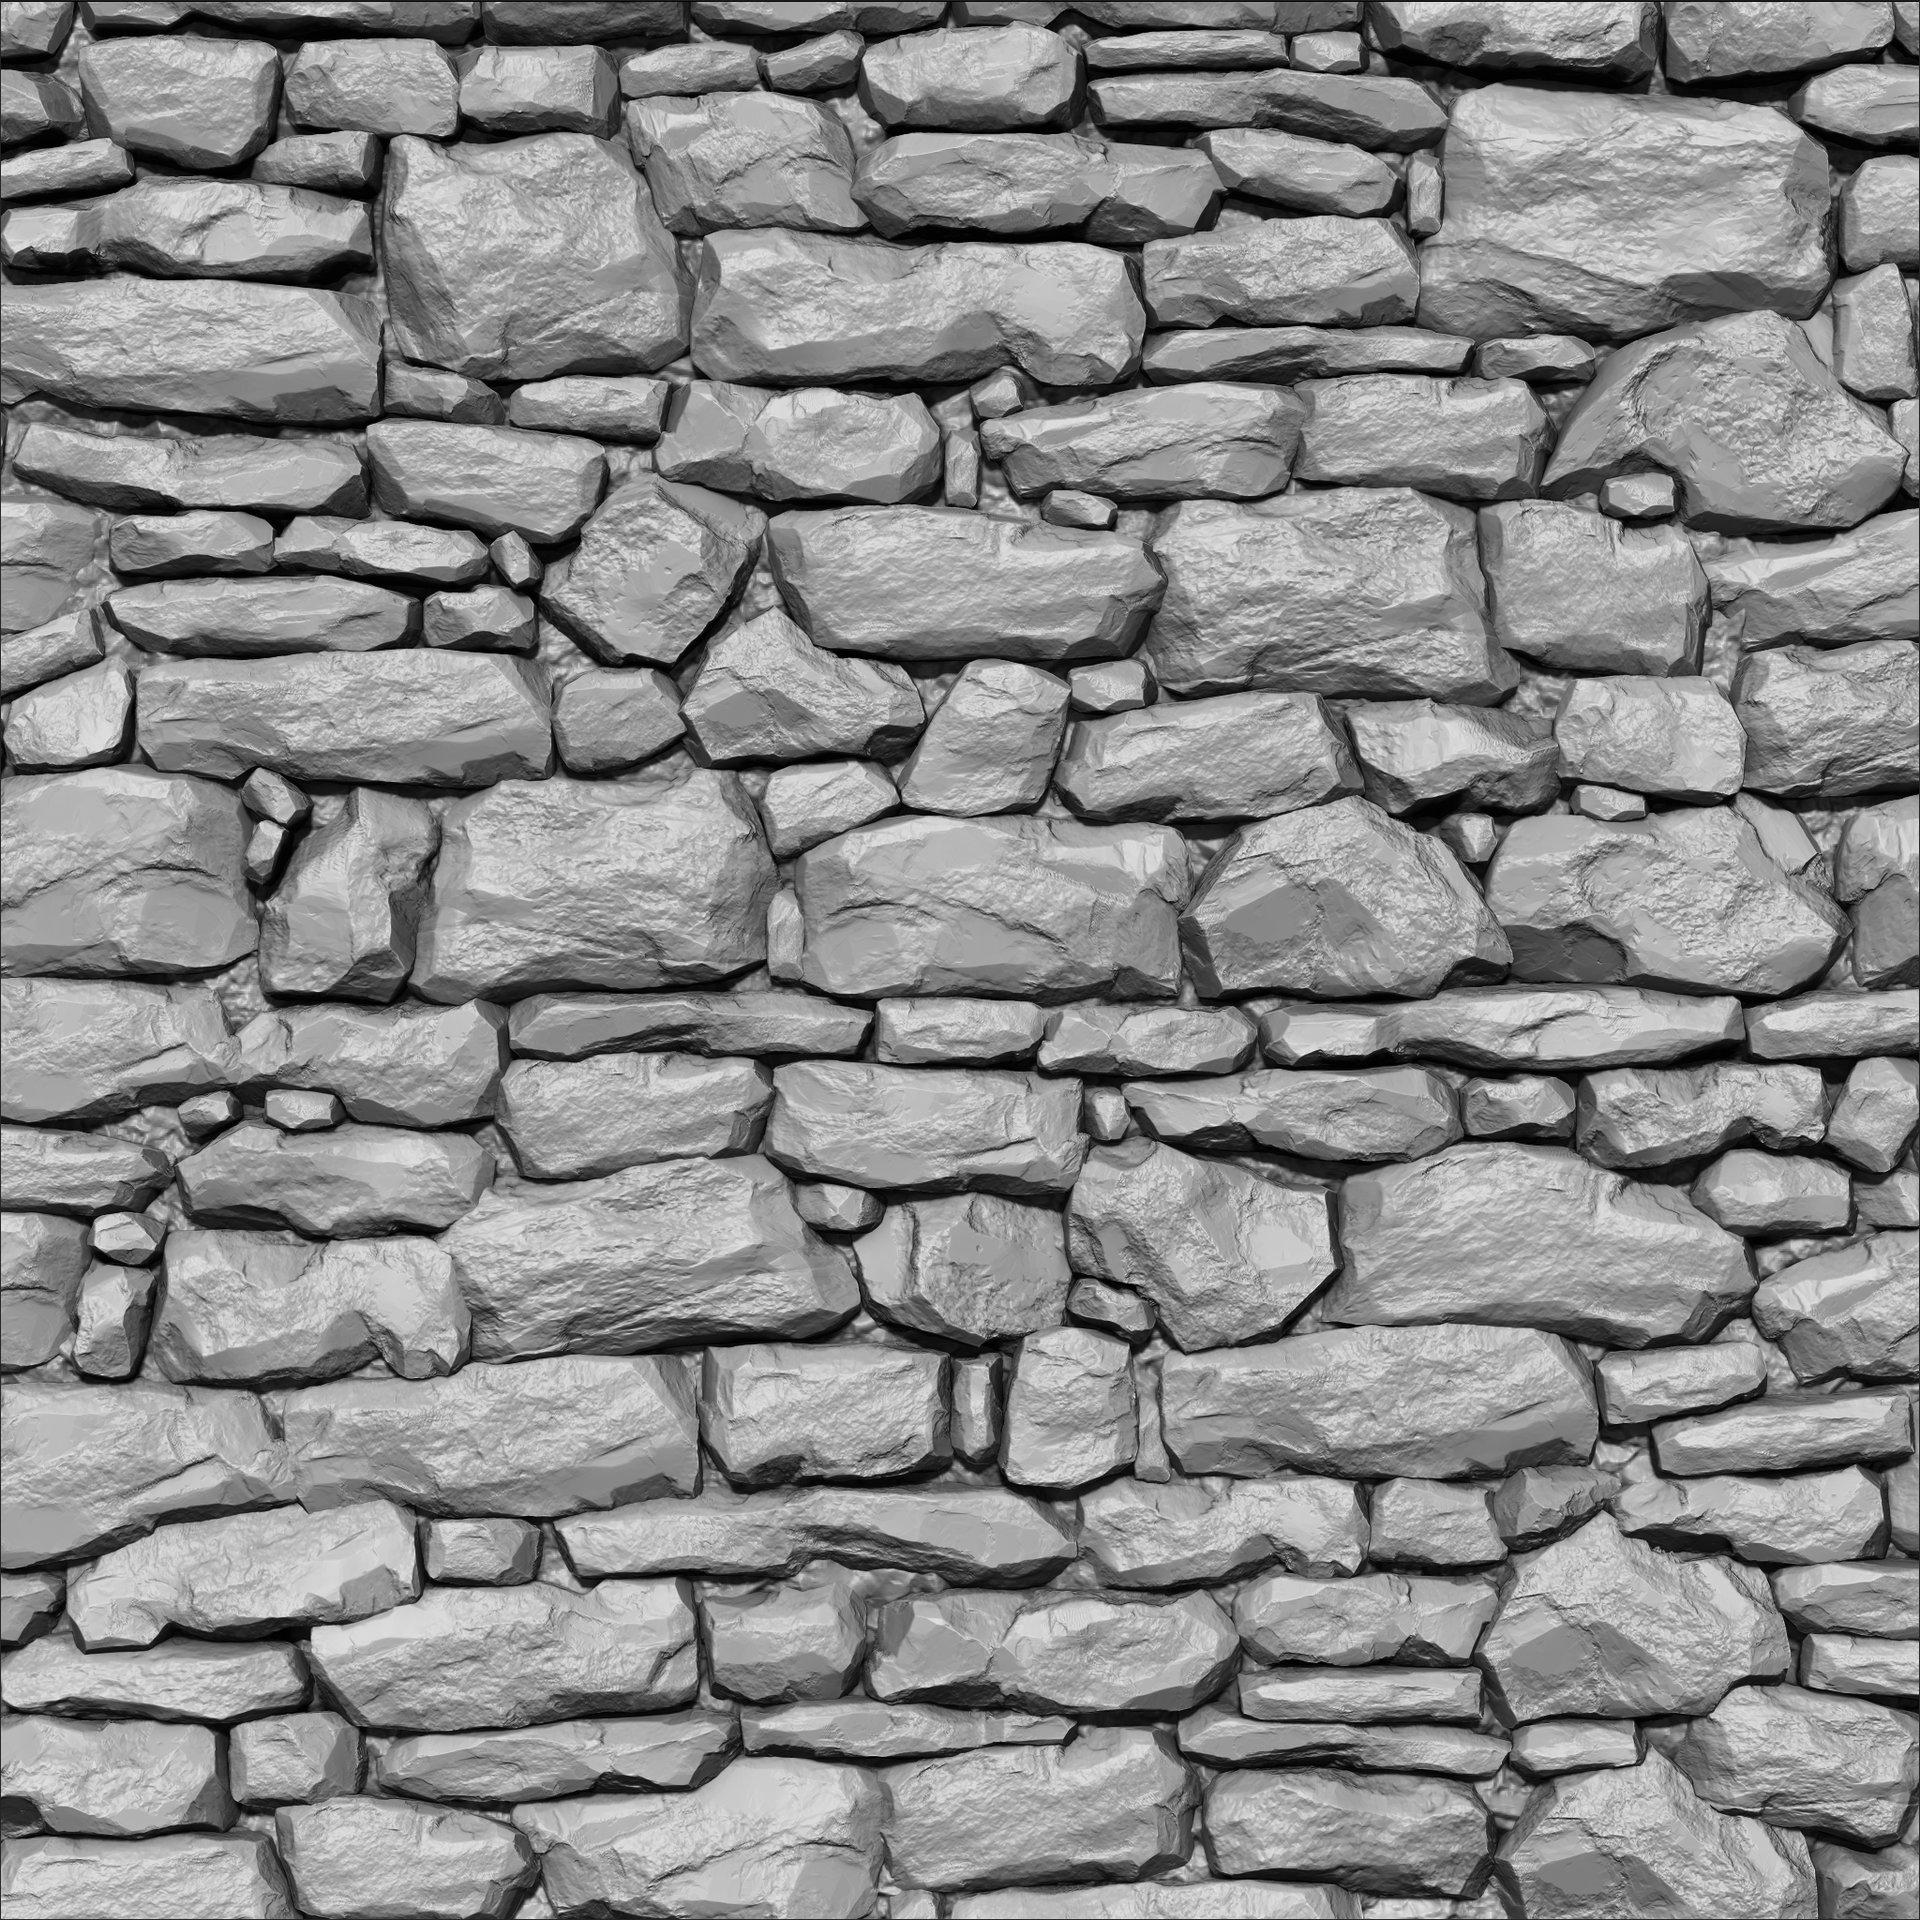 Joakim stigsson stone wall 02 hp